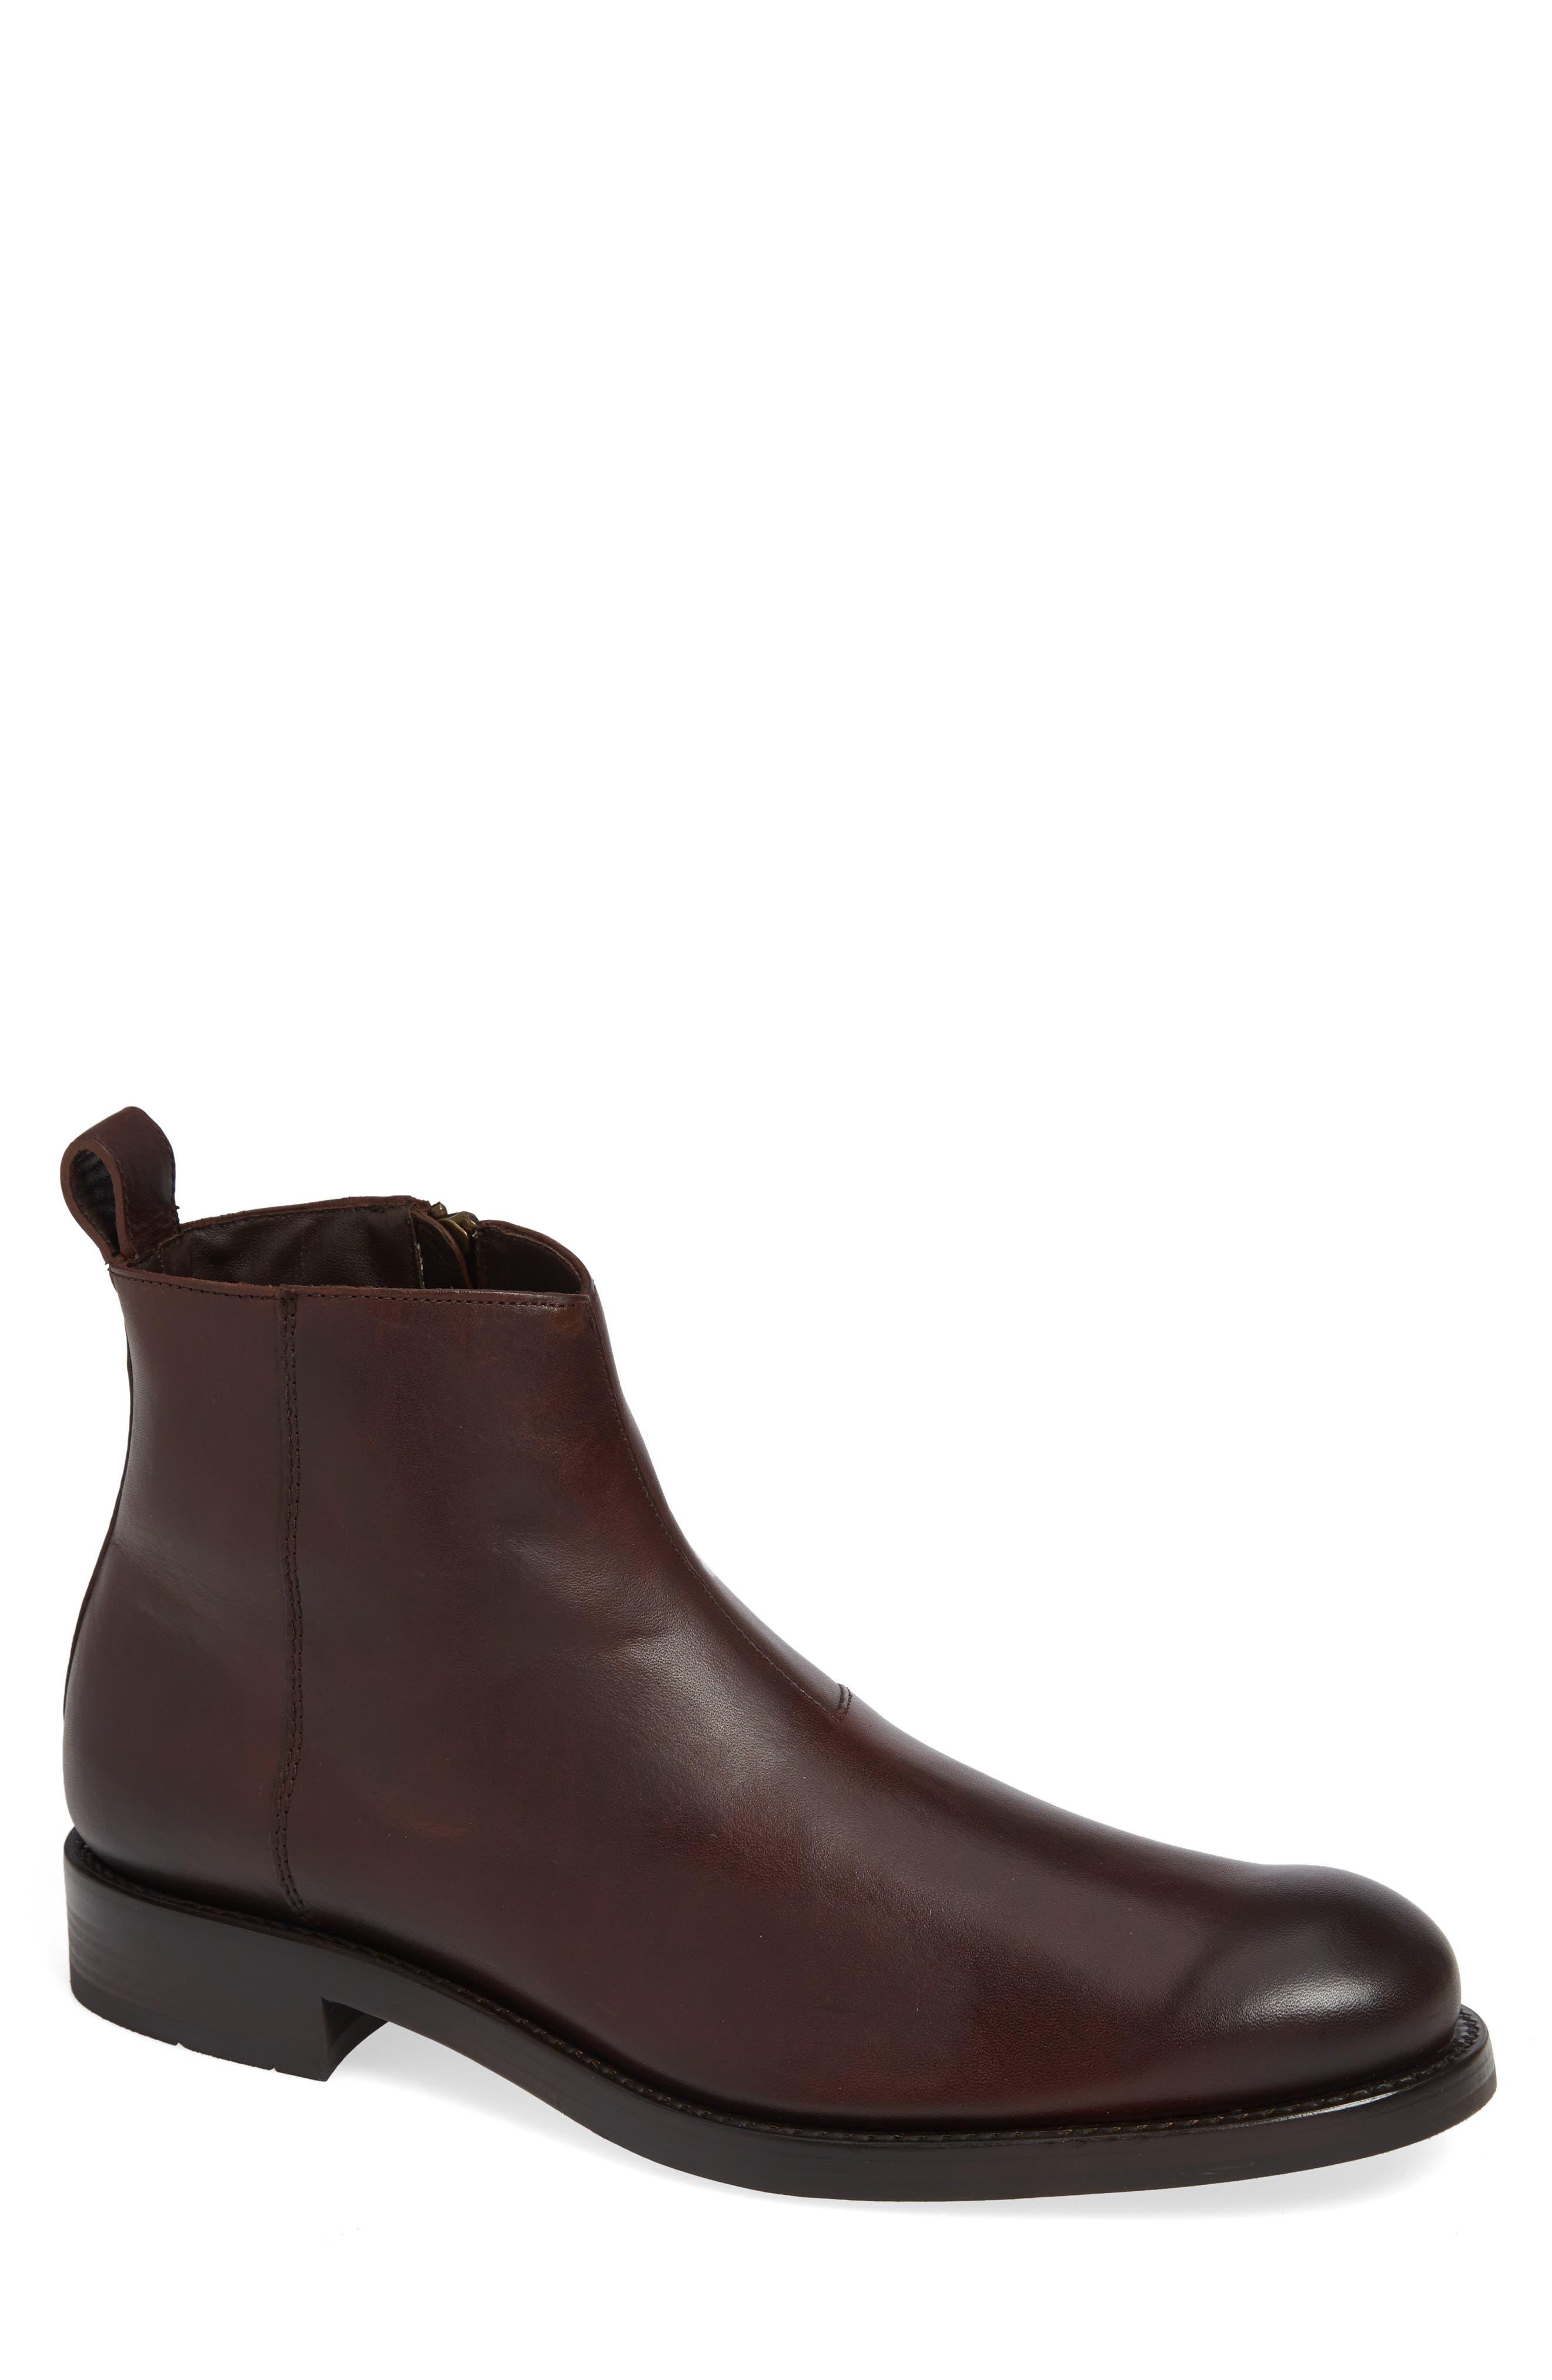 1000 Mile Montague Boot,                         Main,                         color, BROWN